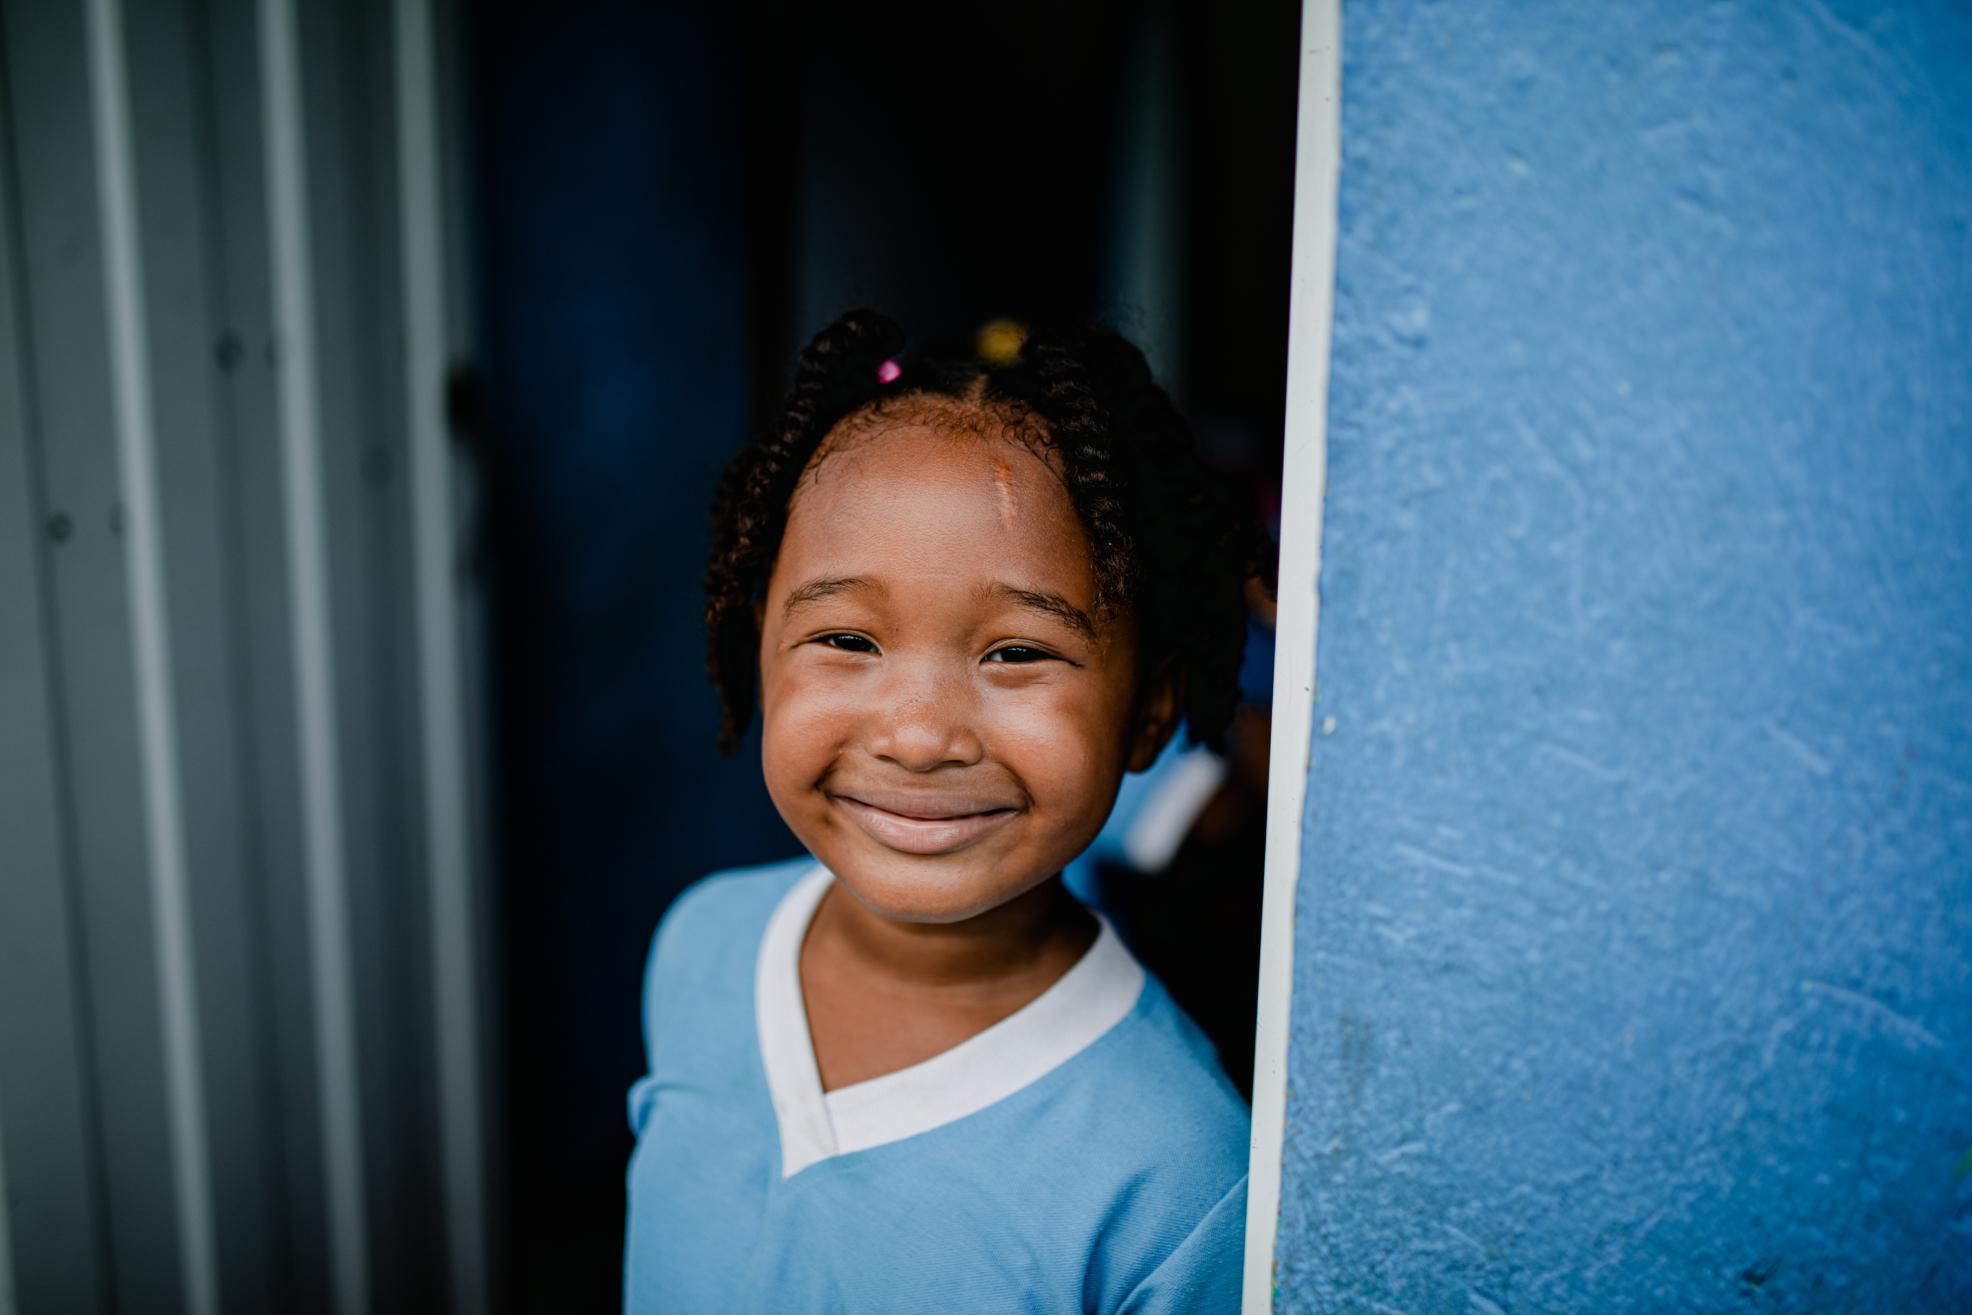 Little girl wearing a light blue shirt smiles big in the doorway